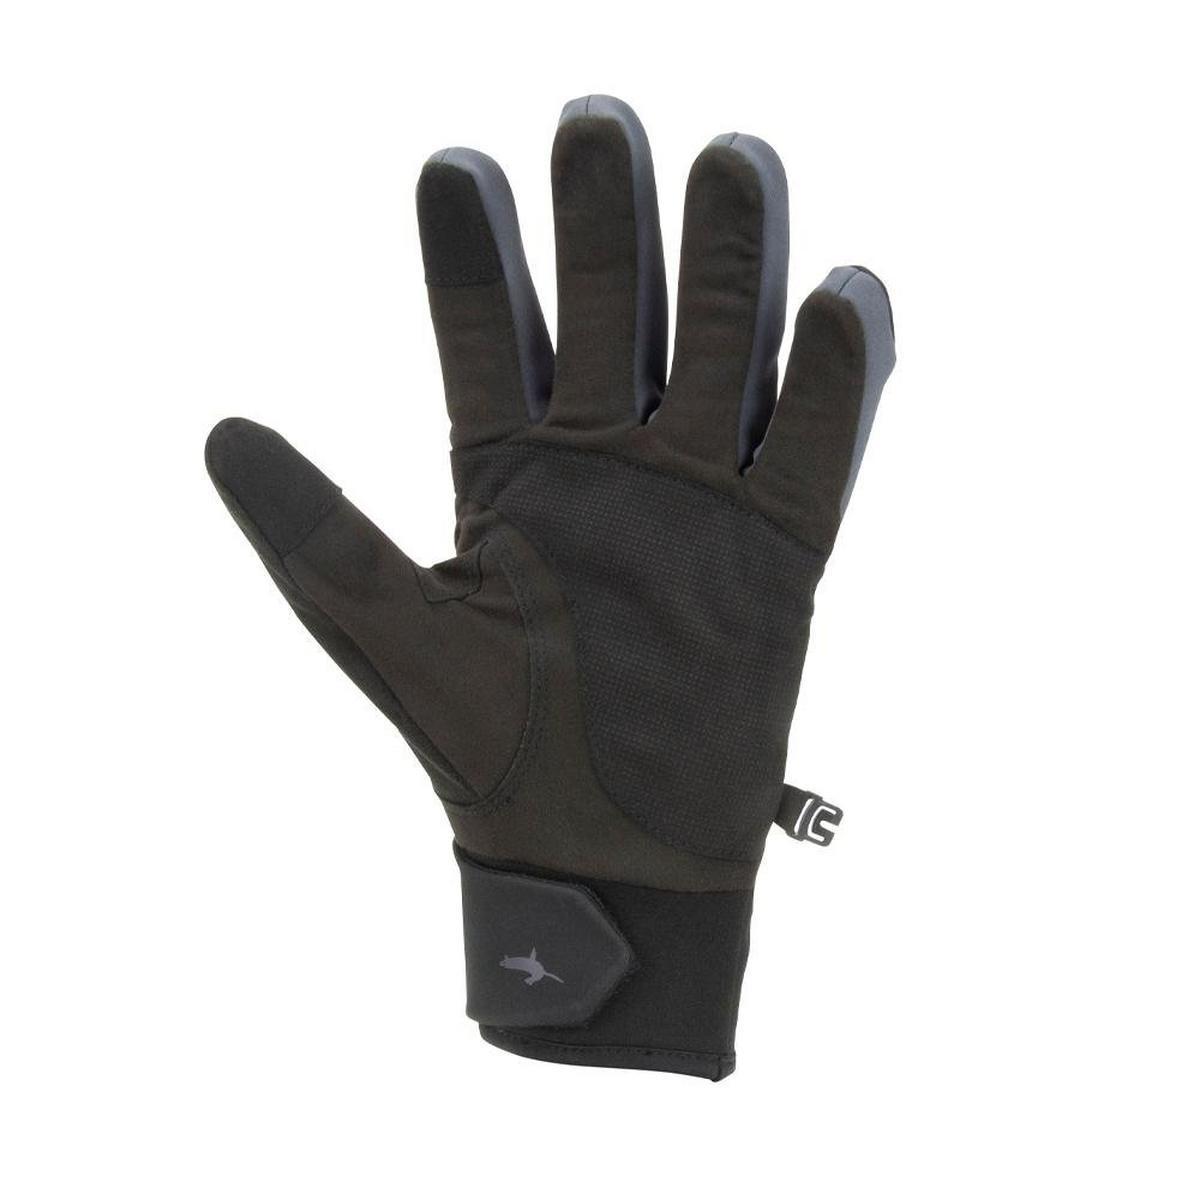 Sealskinz Unisex Sealskinz Waterproof All Weather Glove Fusion Control - Black